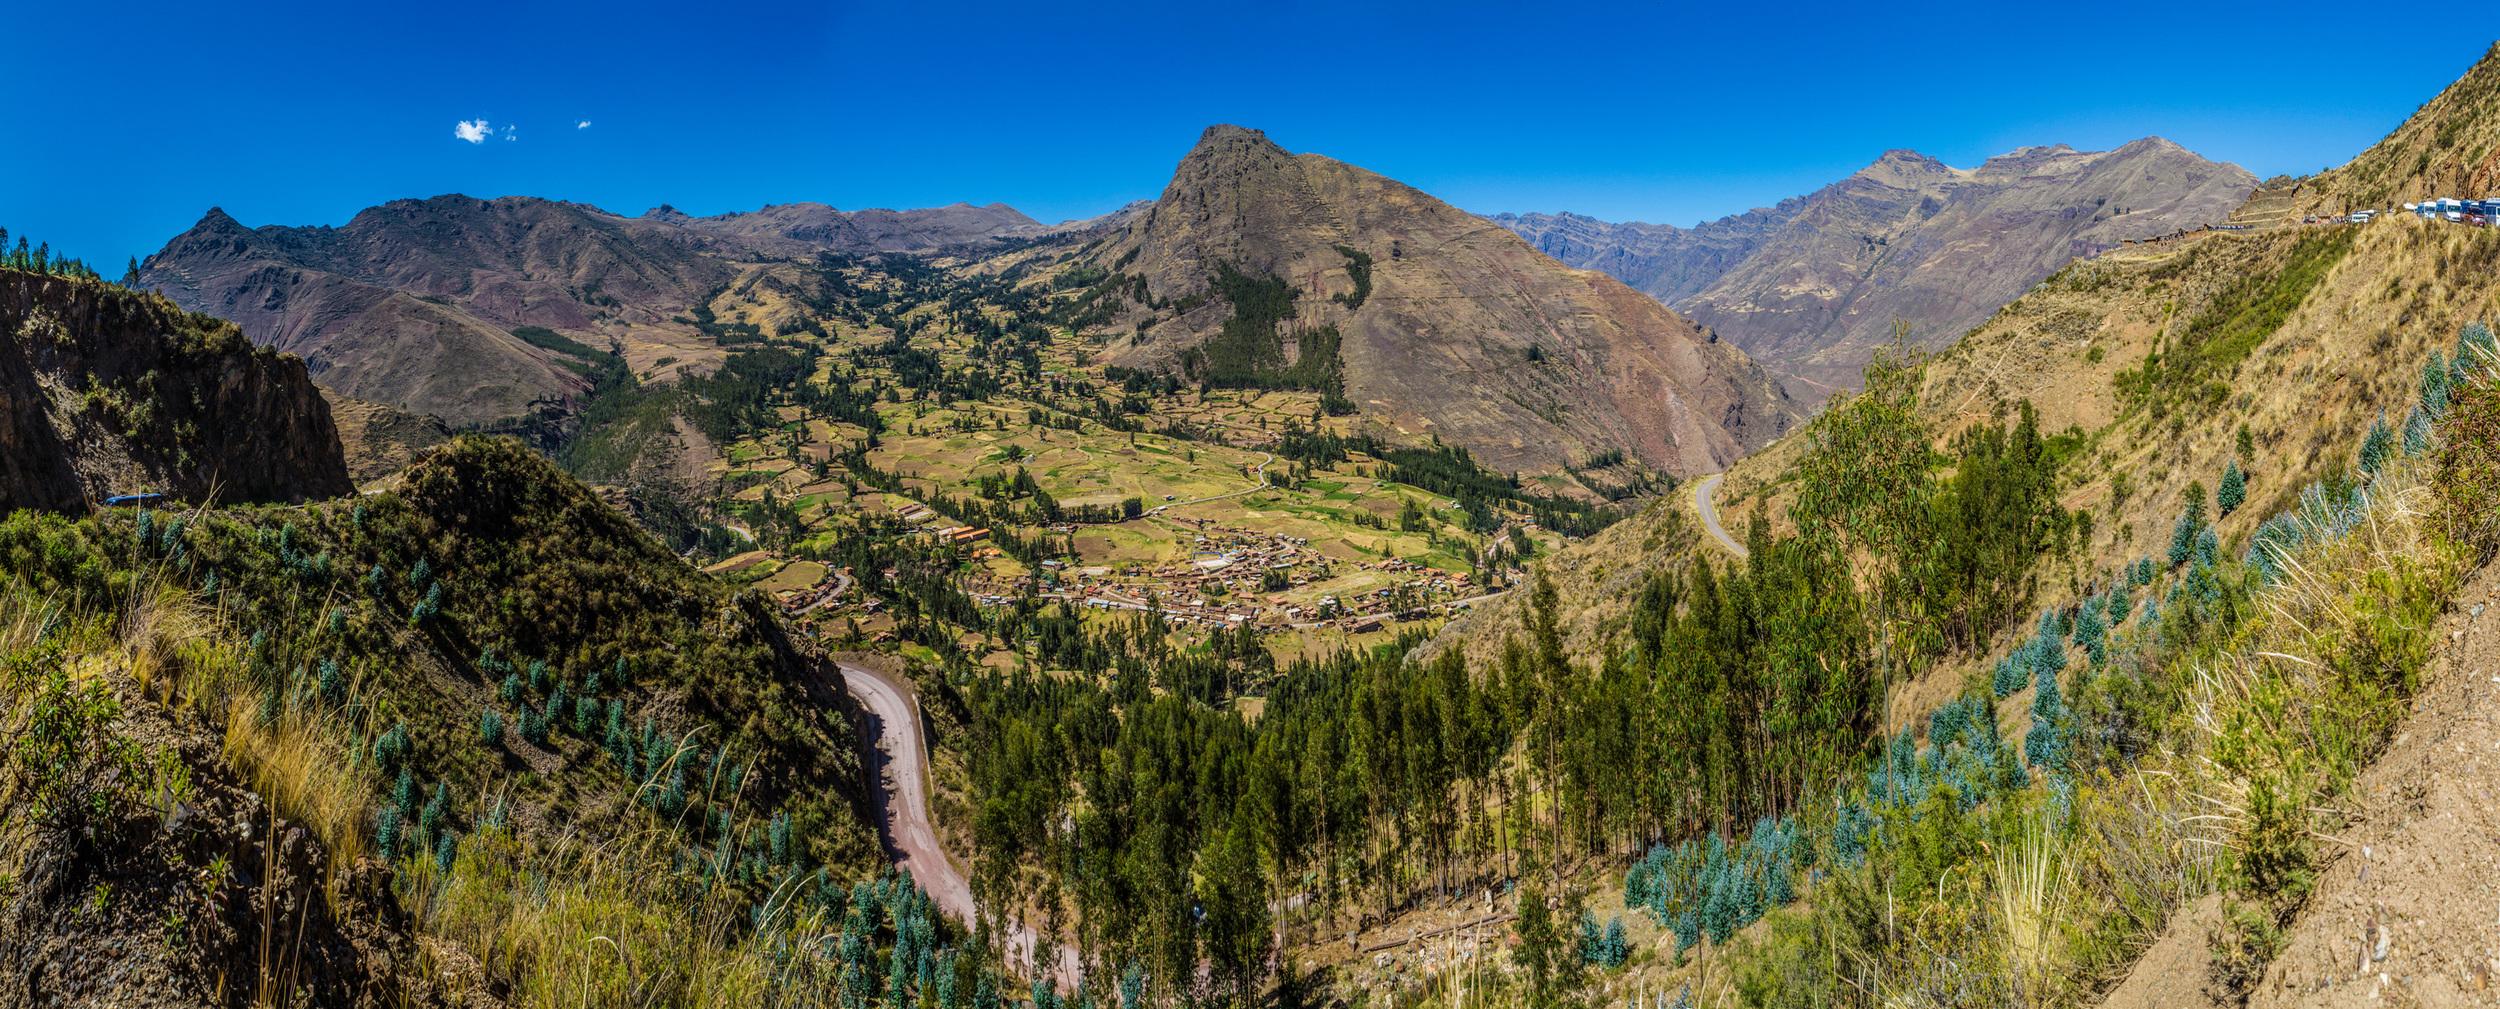 Ali-Barqawi-Studios-Explore-Series-Travel-Adventure-Documentary-C4CGAZA-Peru-Cusco-Sacred-Valley-2015-1330.jpg